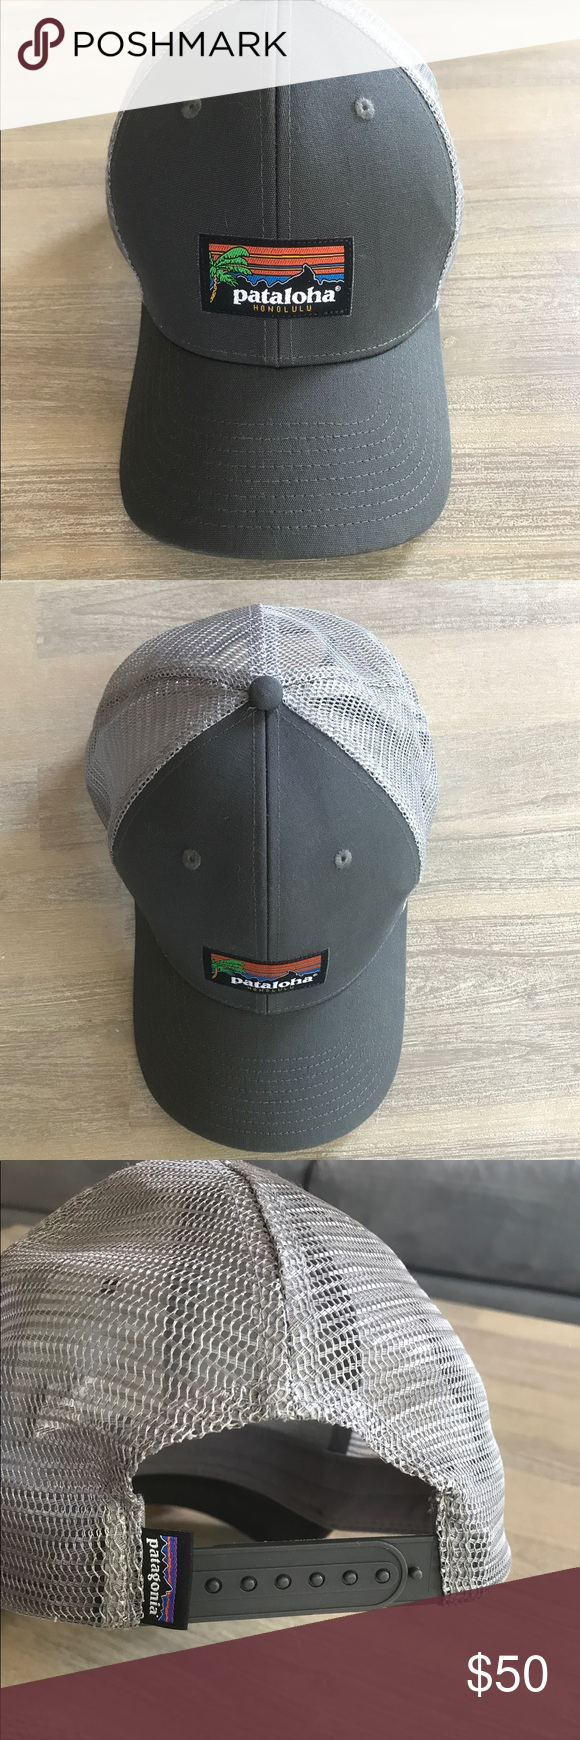 Patagonia Pataloha Trucker Hat Nwot Hats Trucker Hat Patagonia